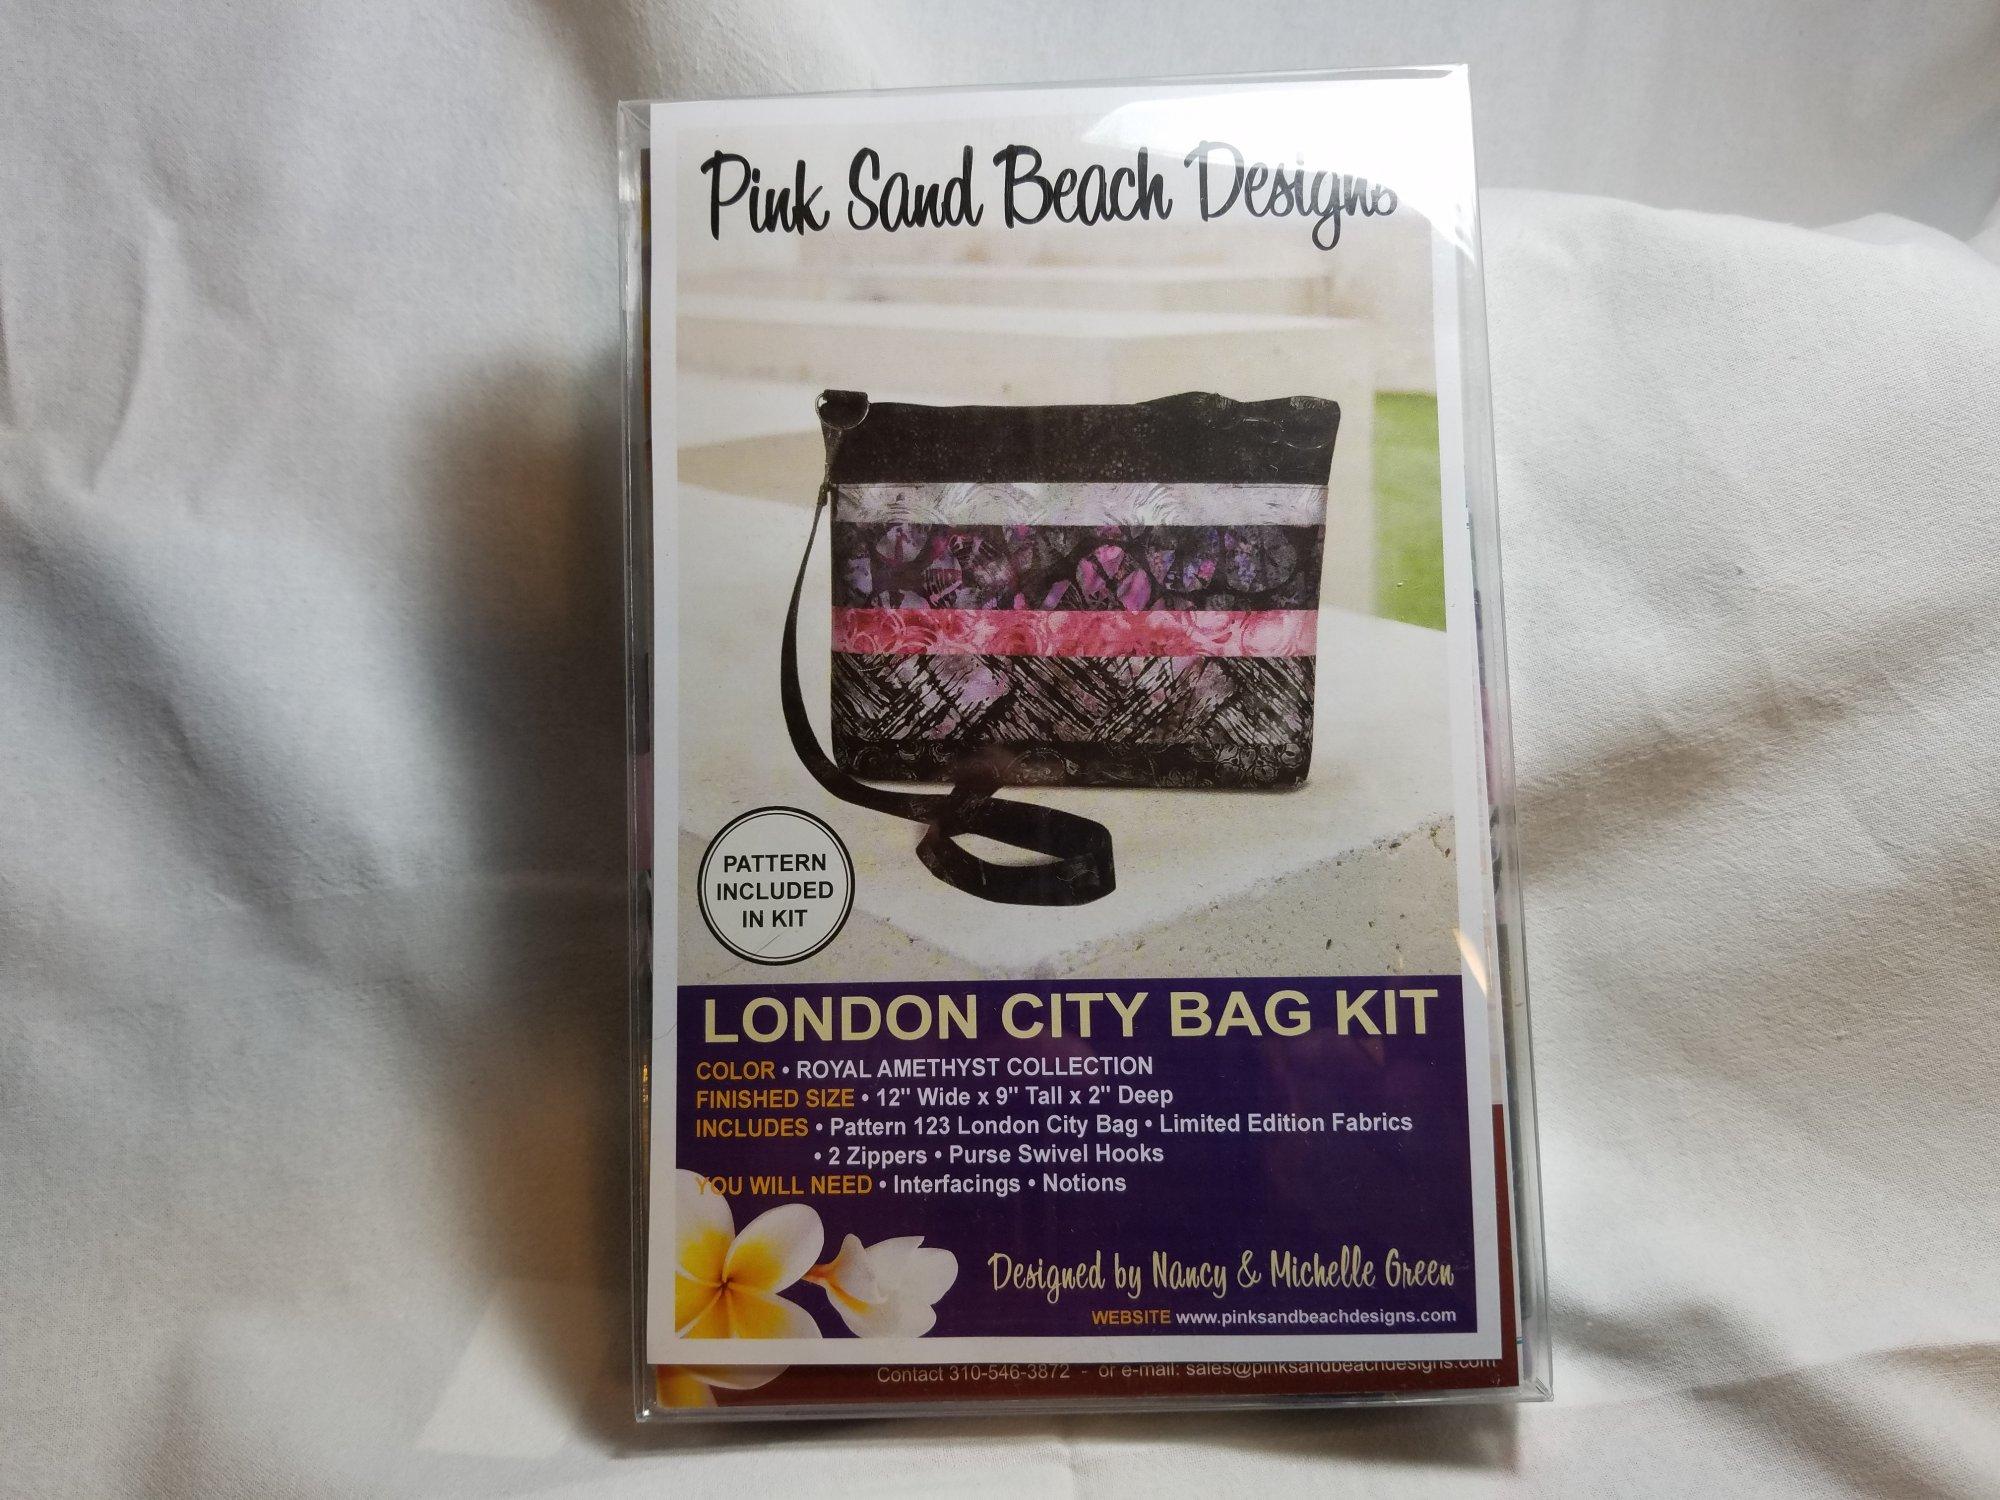 London City Bag Kit